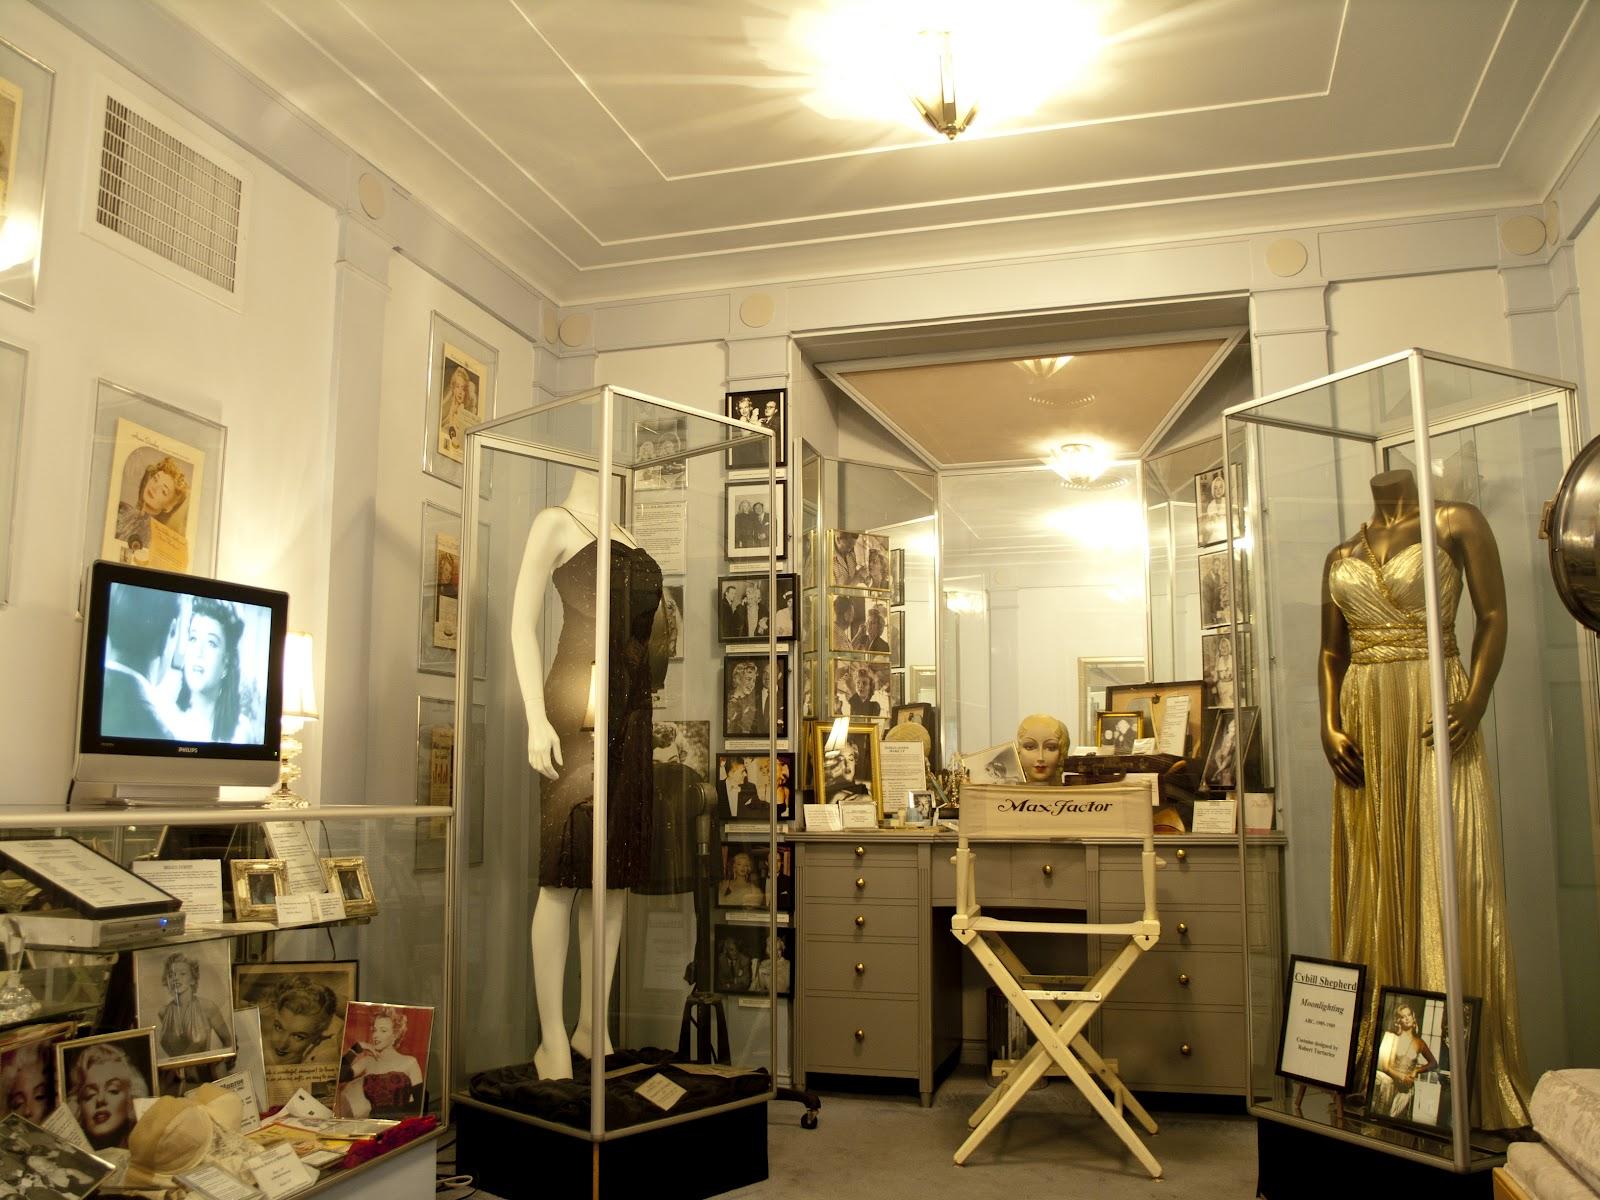 http://3.bp.blogspot.com/-ma8XBf9DMSY/T56RmvTkT7I/AAAAAAAAAjA/OsjKtXqn6mc/s1600/P4227071+hollywood+museum+monroe.jpg